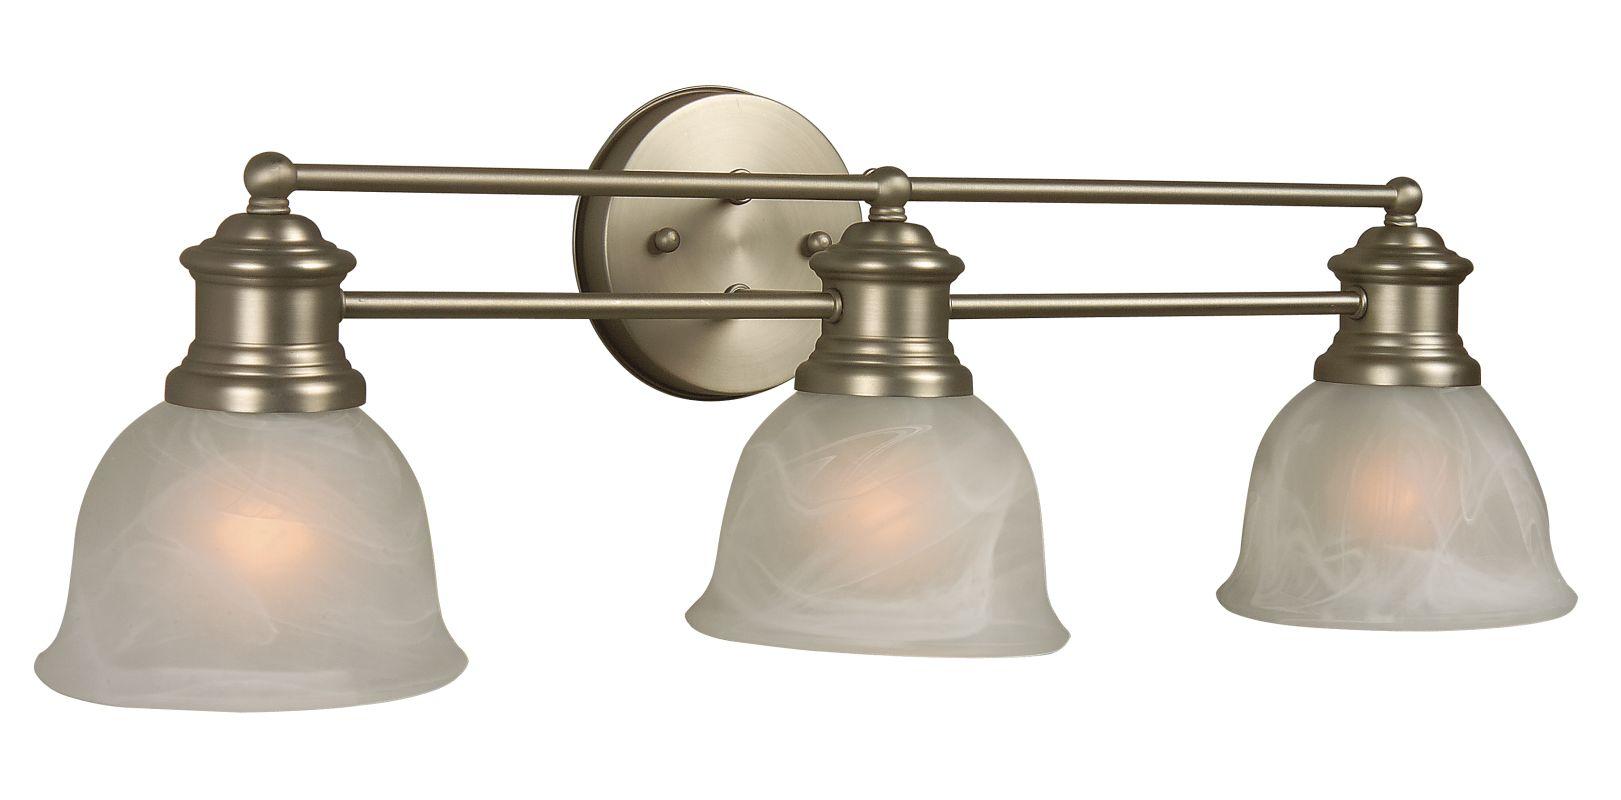 "New 3 Light Bathroom Vanity Lighting Fixture Brushed: Craftmade 19822BN3 Brushed Nickel Lite Rail 22"" Wide 3"